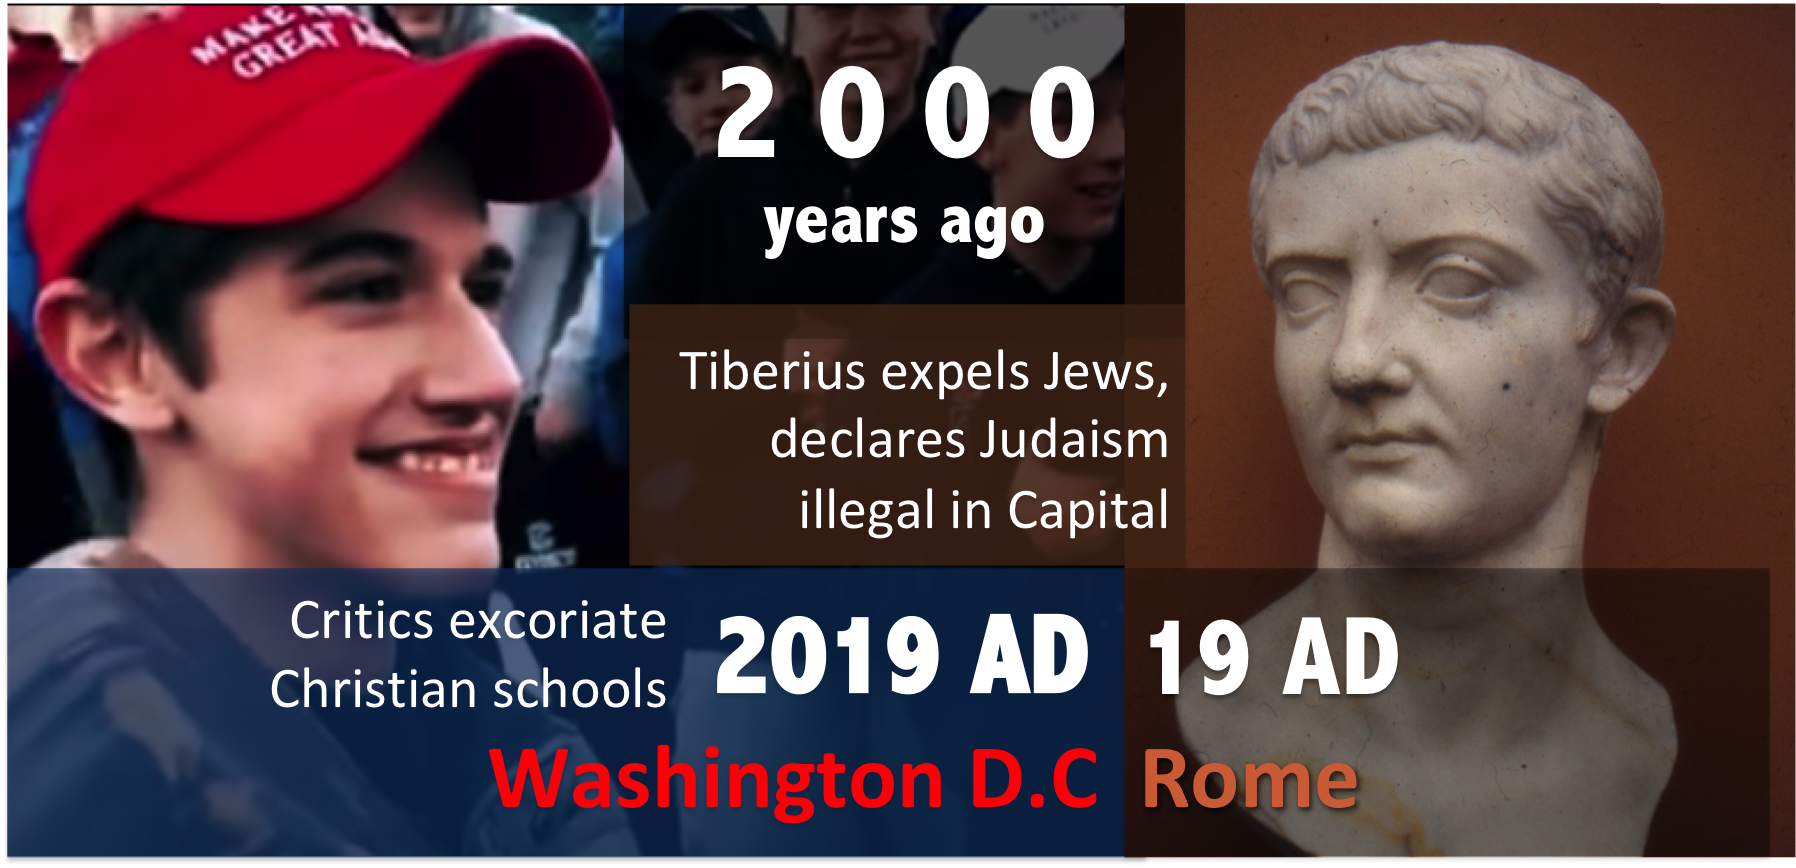 Hindsight is 2019/19 A.D.